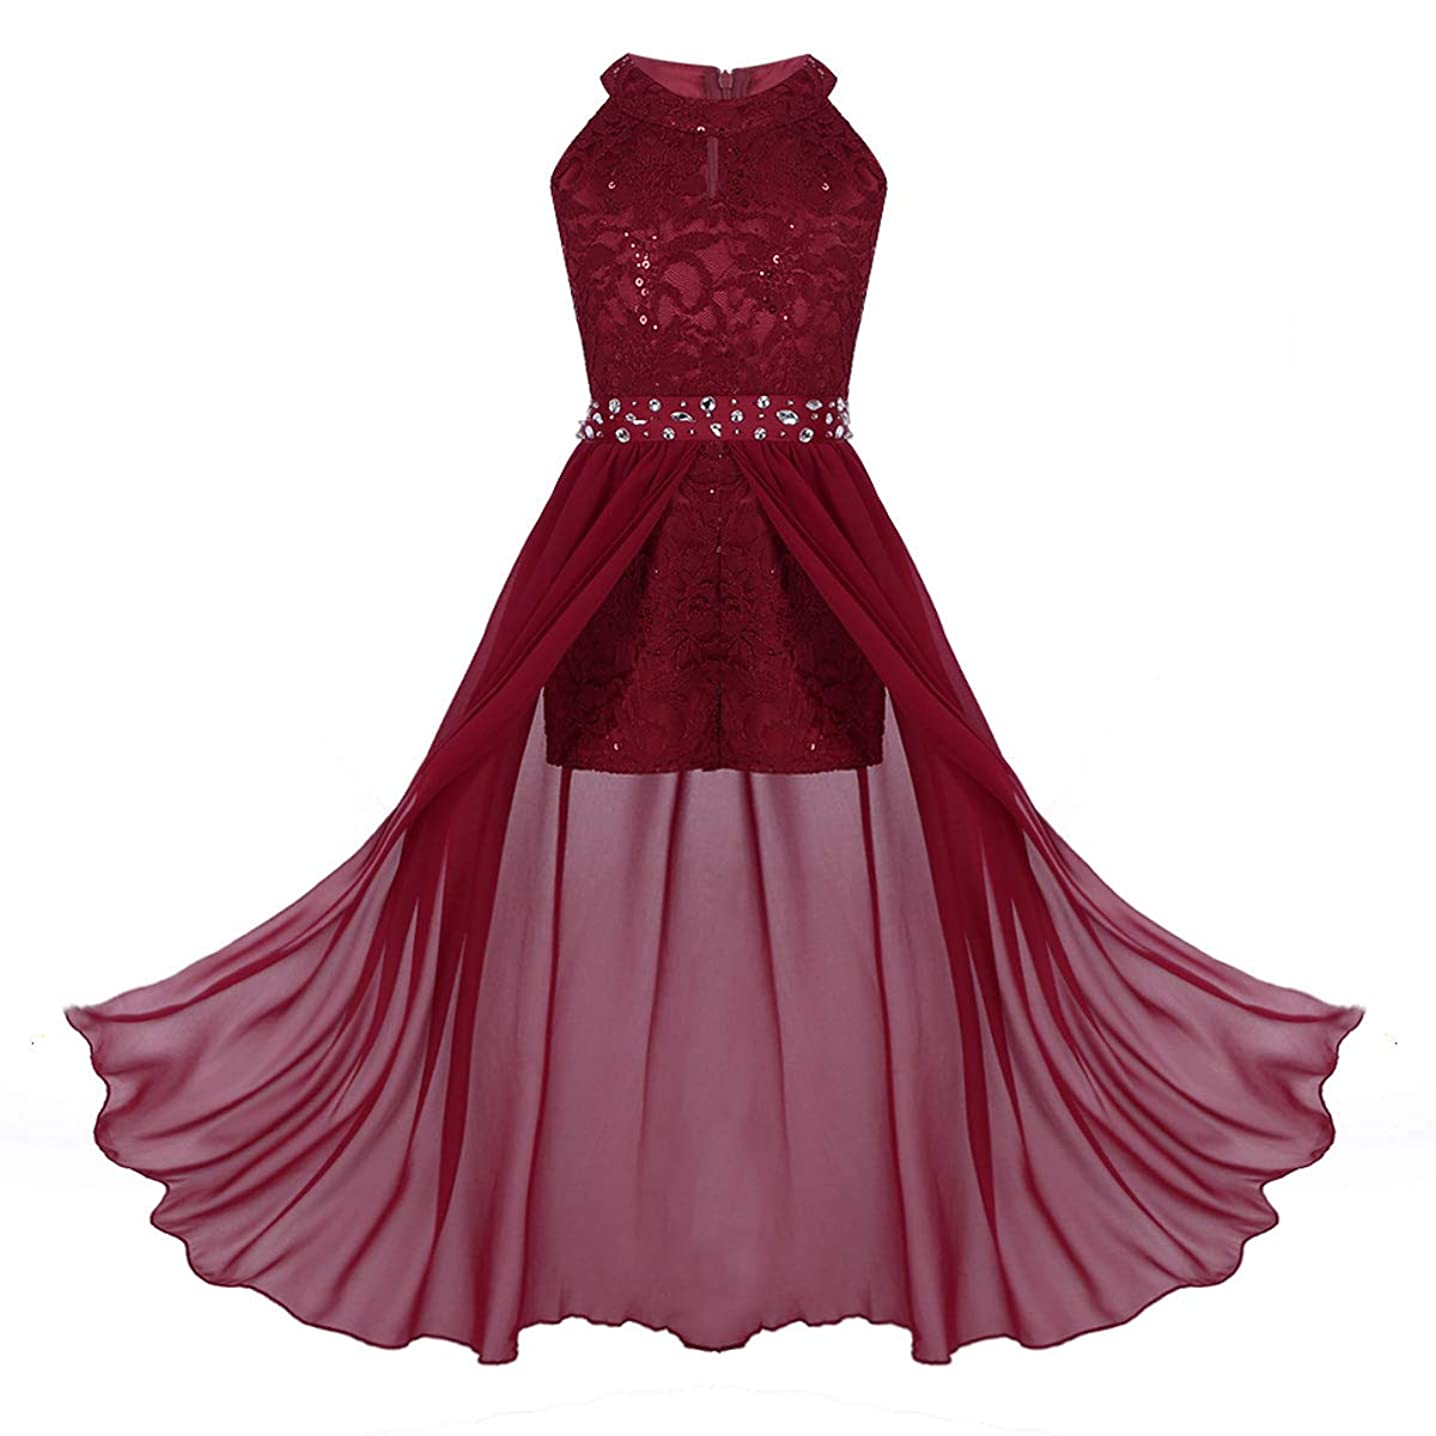 inhzoy Teen Girls Floral Lace Rhinestone Formal Dance Long Romper Dress for Princess Birthday Party School Dancewear